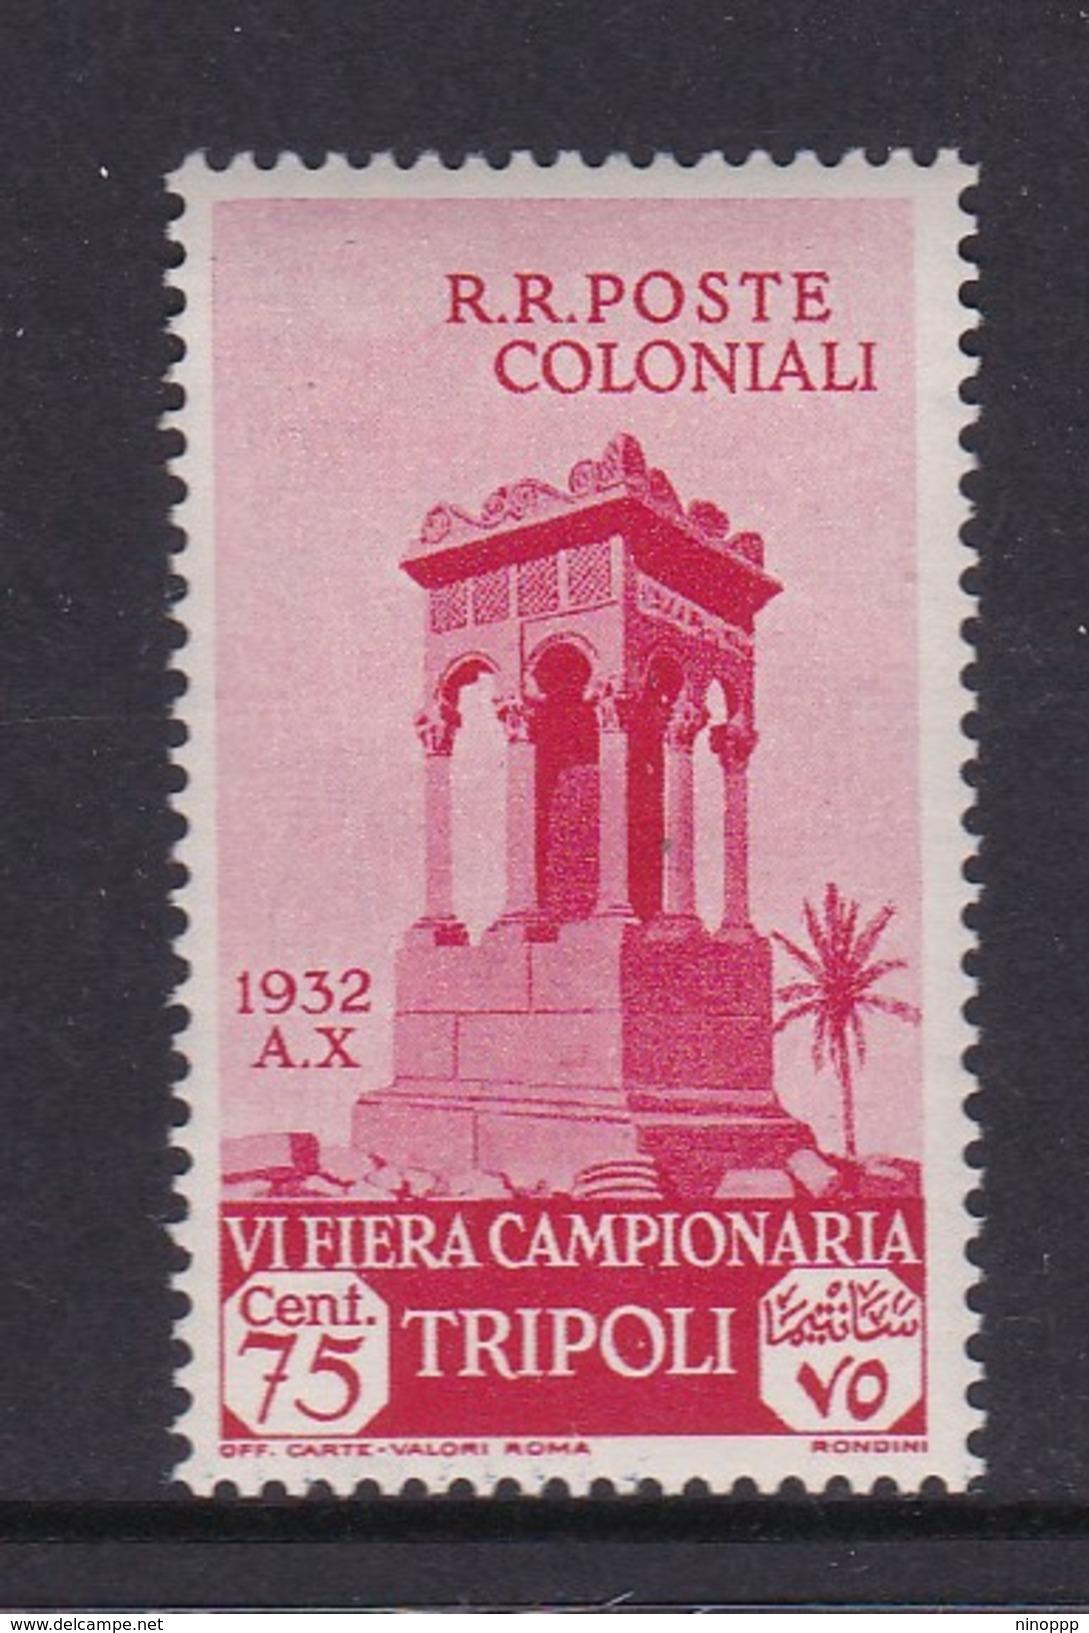 Italy-Colonies And Territories-Libya S 113 1932 Sixth Sample Fair,Tripoli ,75c Carmine,mausoleum Ghirza,mint Hinged - Libya